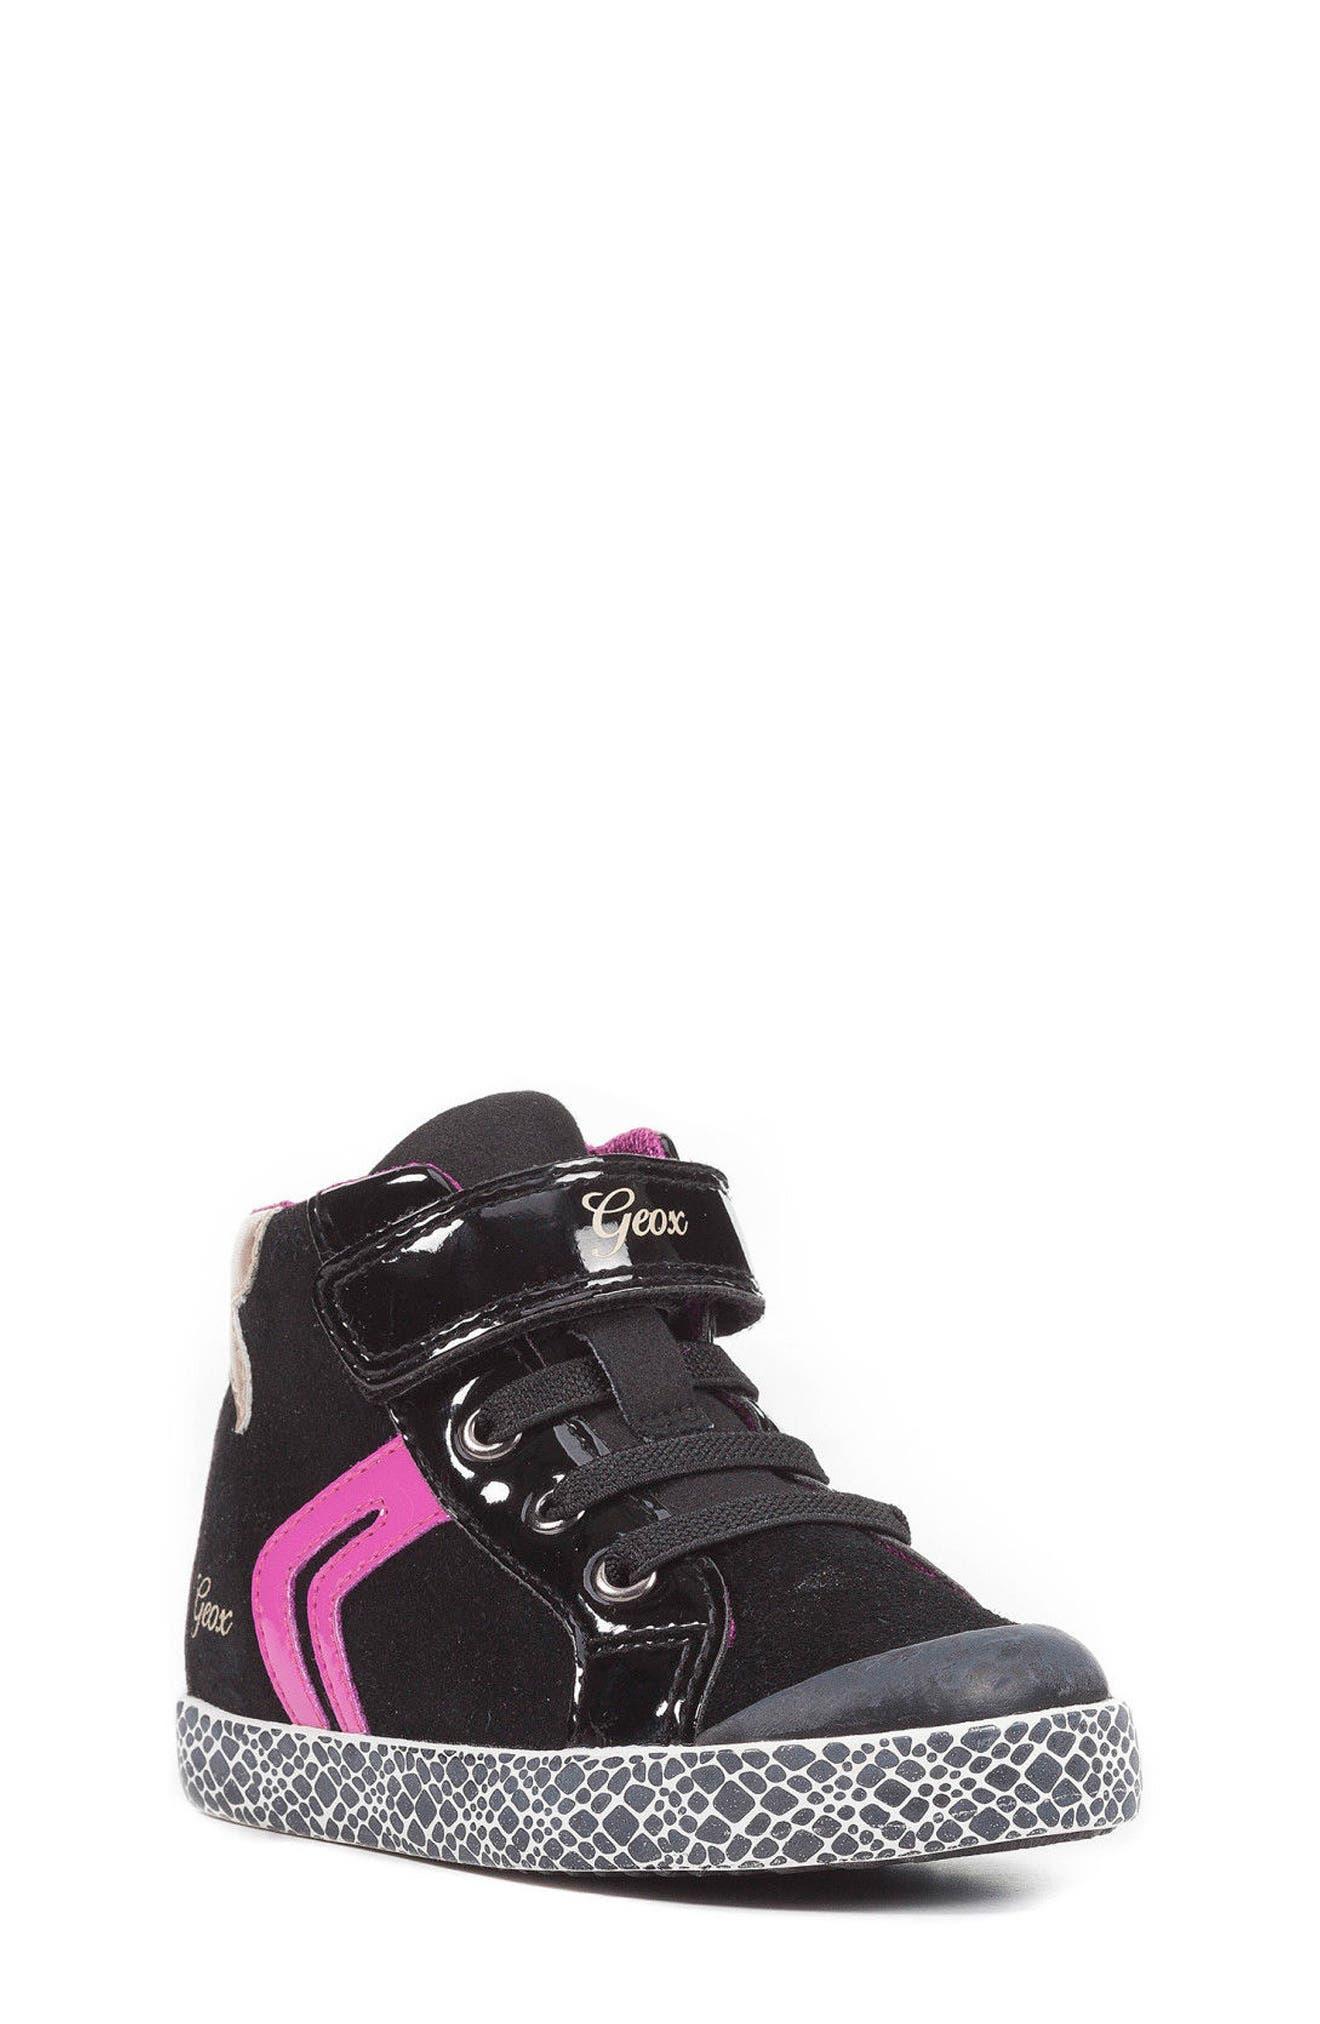 Kiwi Girl High Top Sneaker,                             Main thumbnail 1, color,                             Black/ Cyclamen